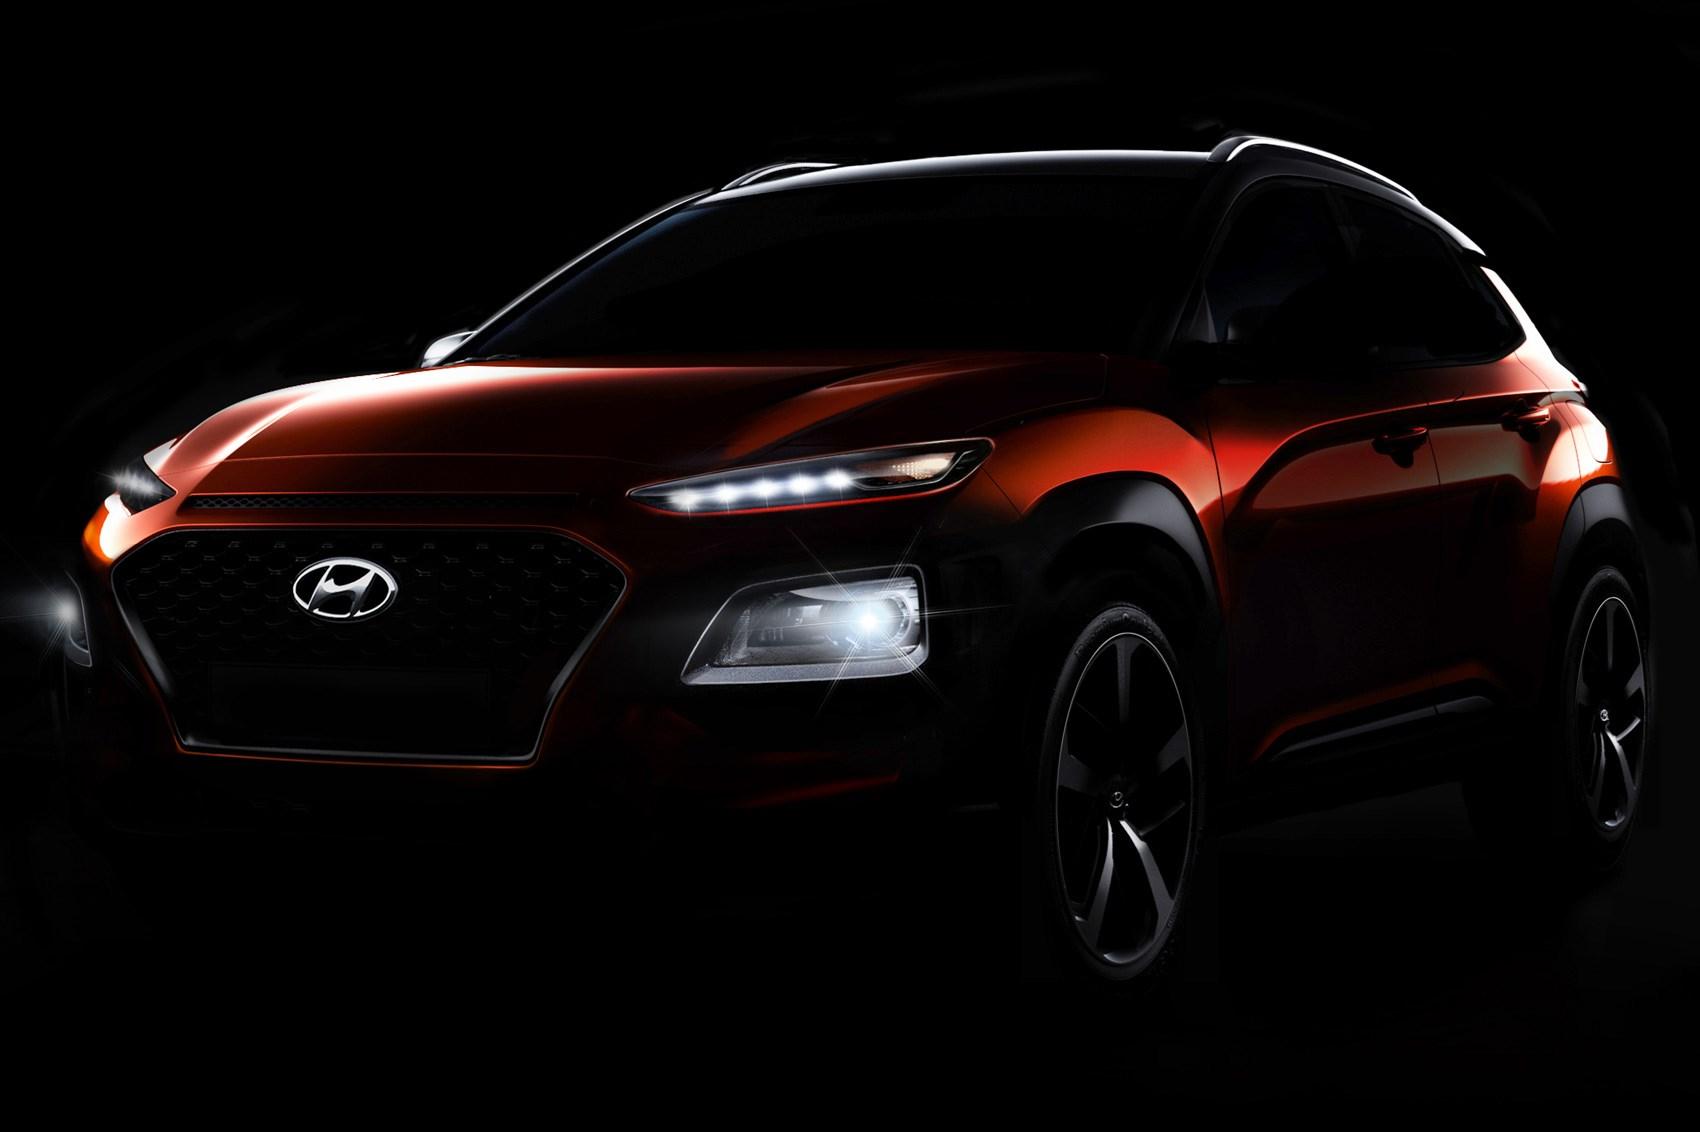 New Hyundai Kona SUV: specs, details, photos by CAR Magazine